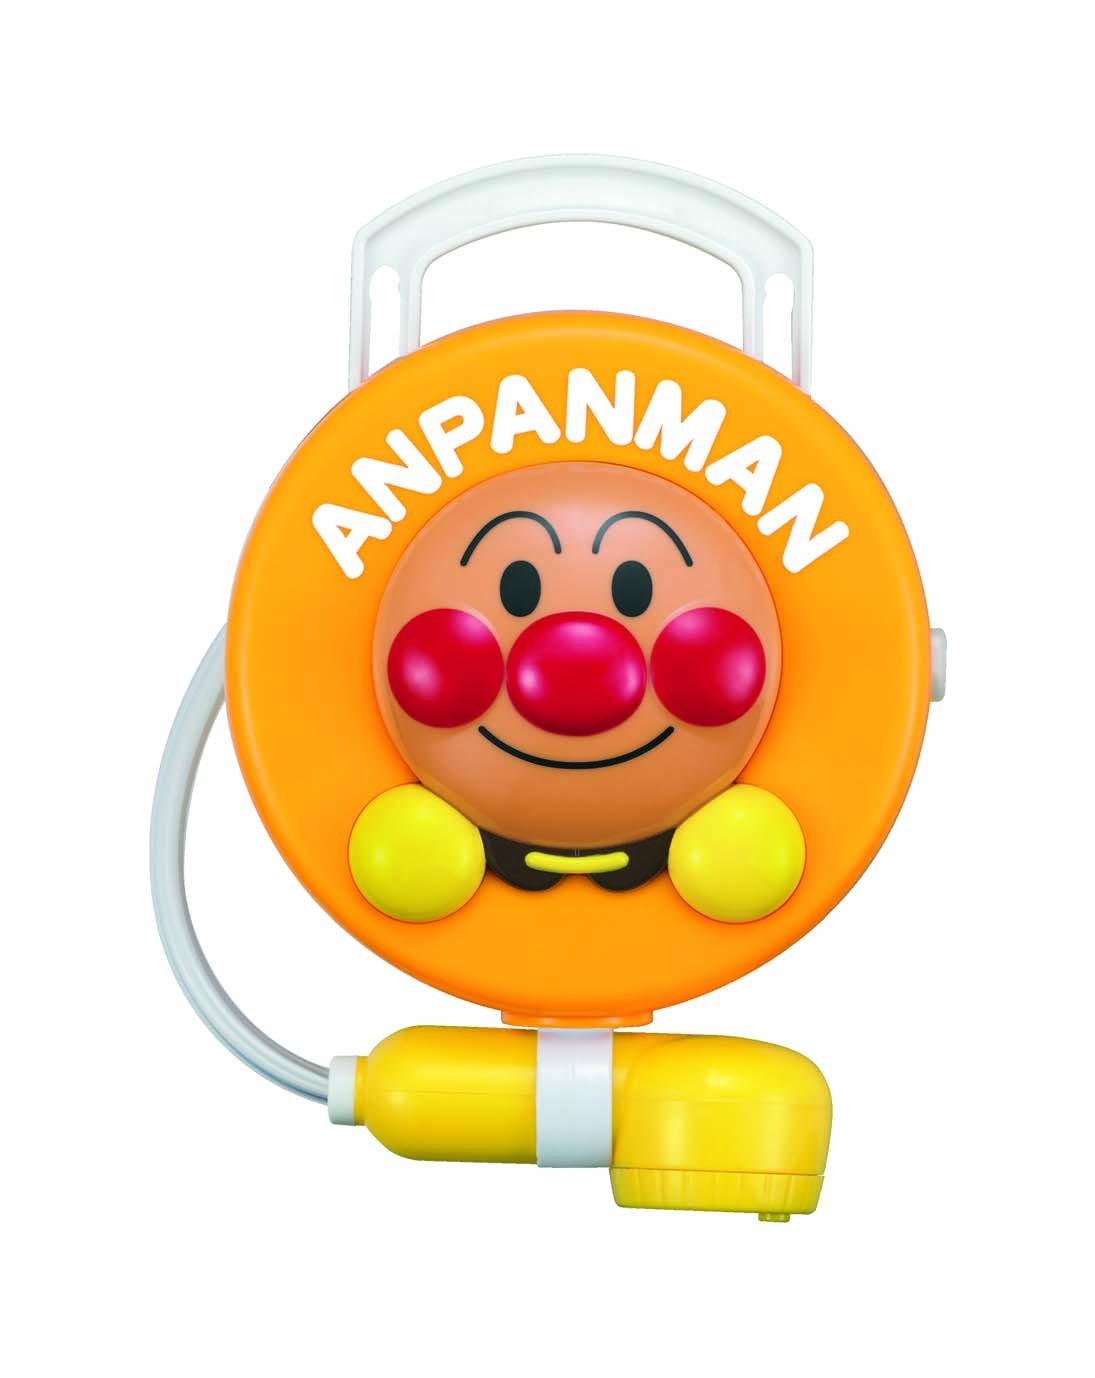 Agatsuma Anpanman Anywhere Shower (Renewal)